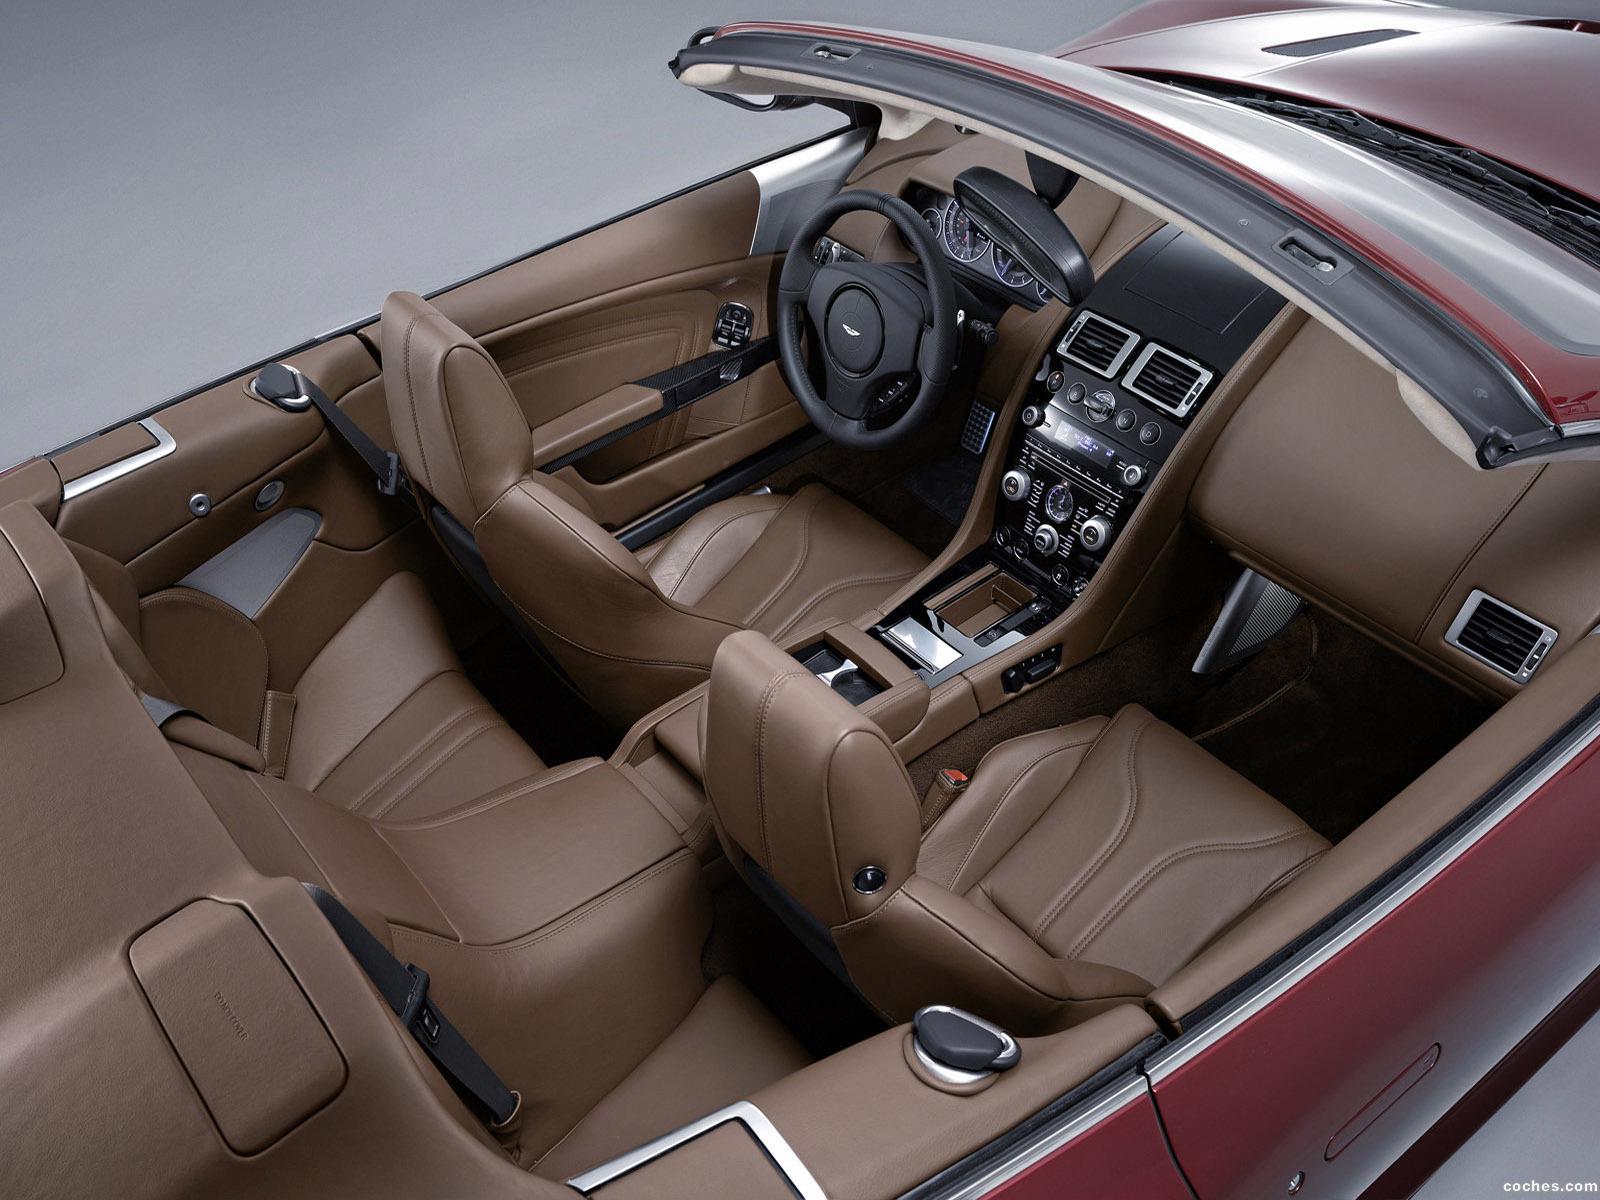 Foto 12 de Aston Martin DBS Volante 2009